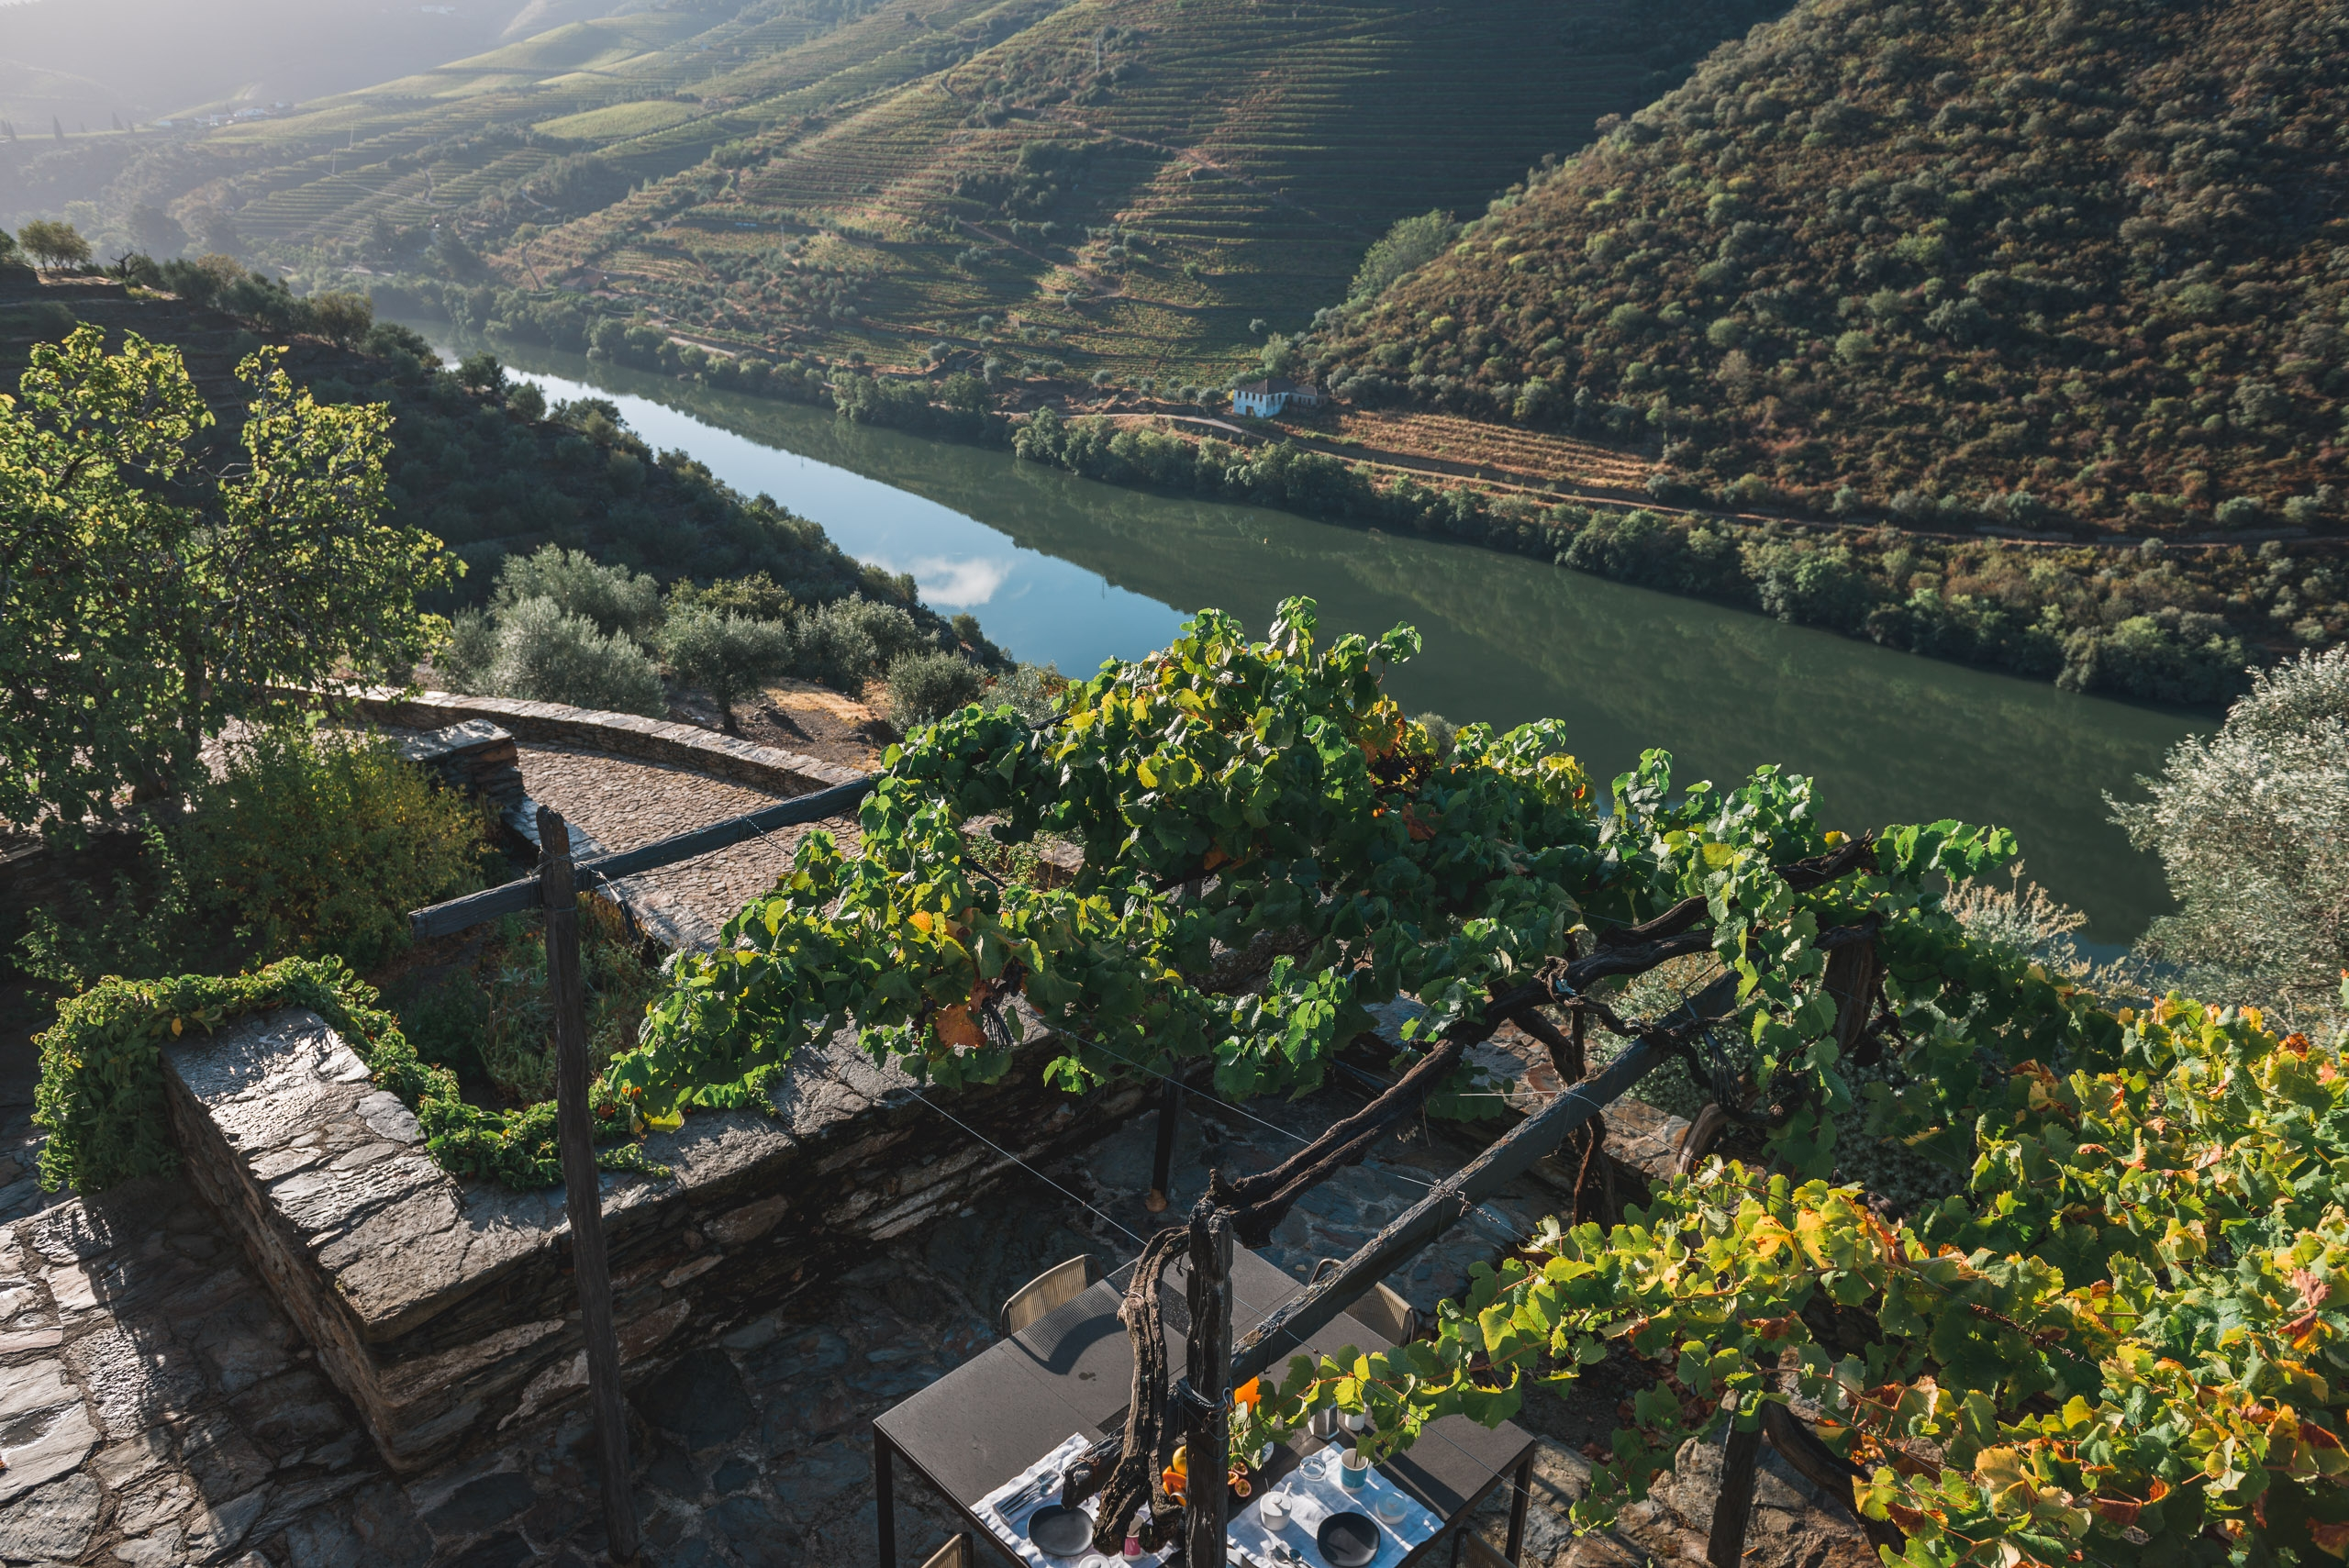 Portugal - The Douro Valley - 2012-0926-DSC_1858_54201